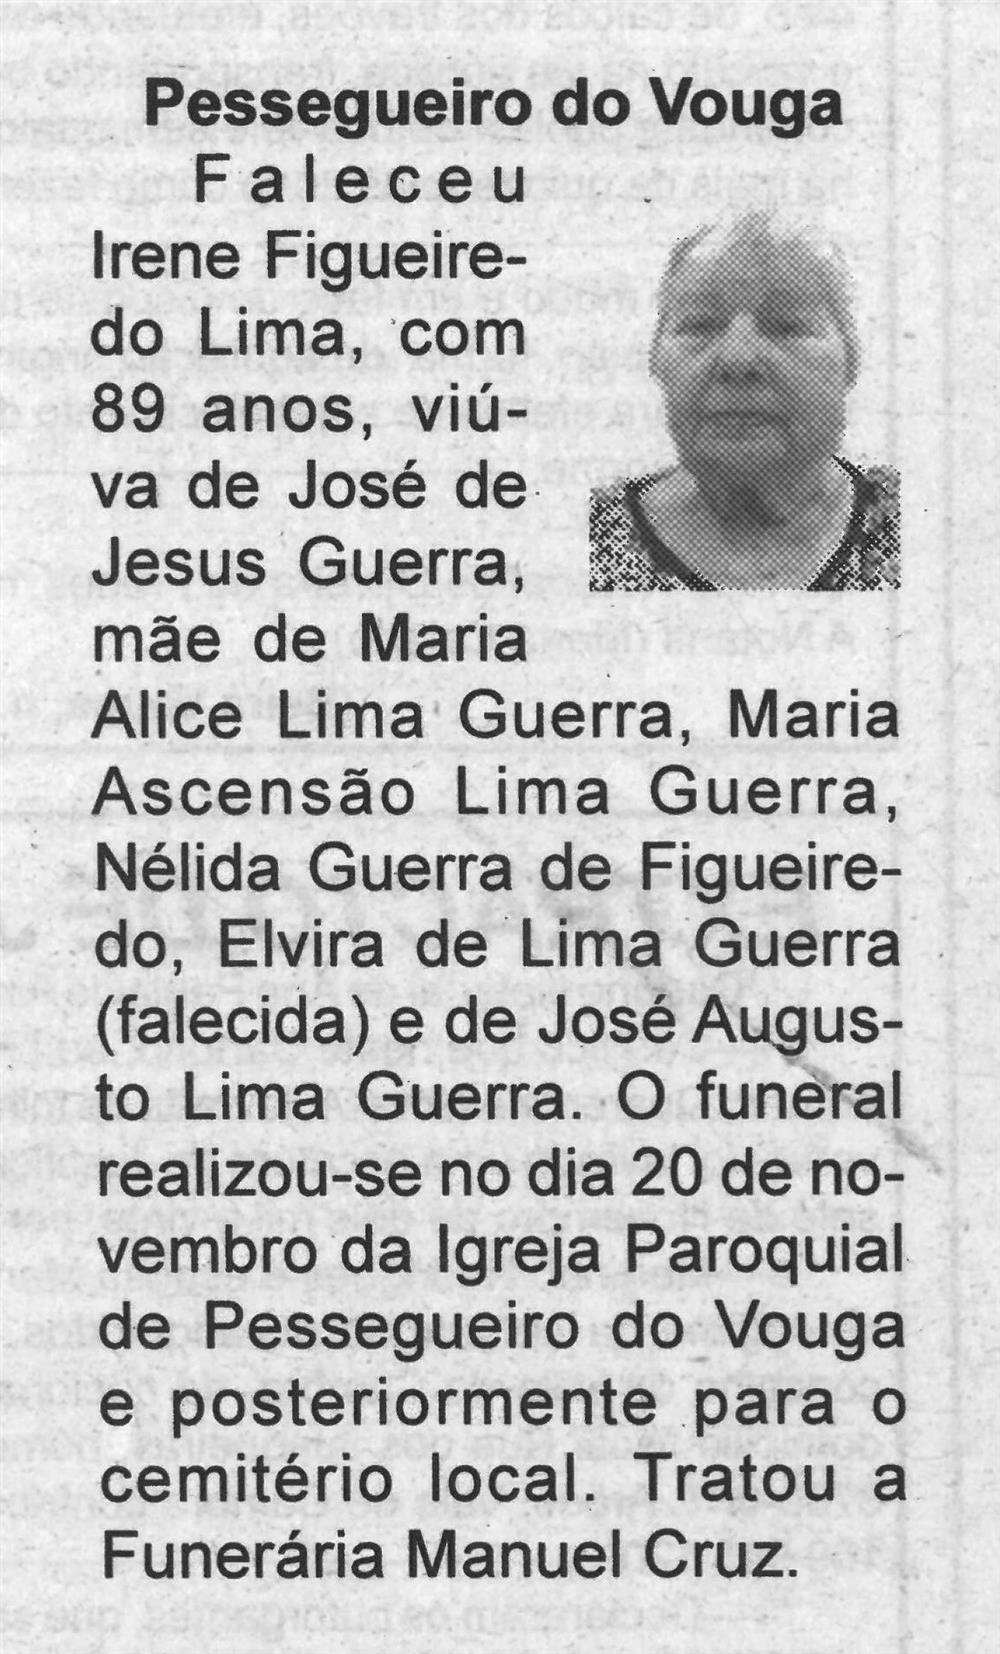 BV-2.ªdez.'20-p.13-Pessegueiro do Vouga : [Irene Figueiredo Lima].jpg